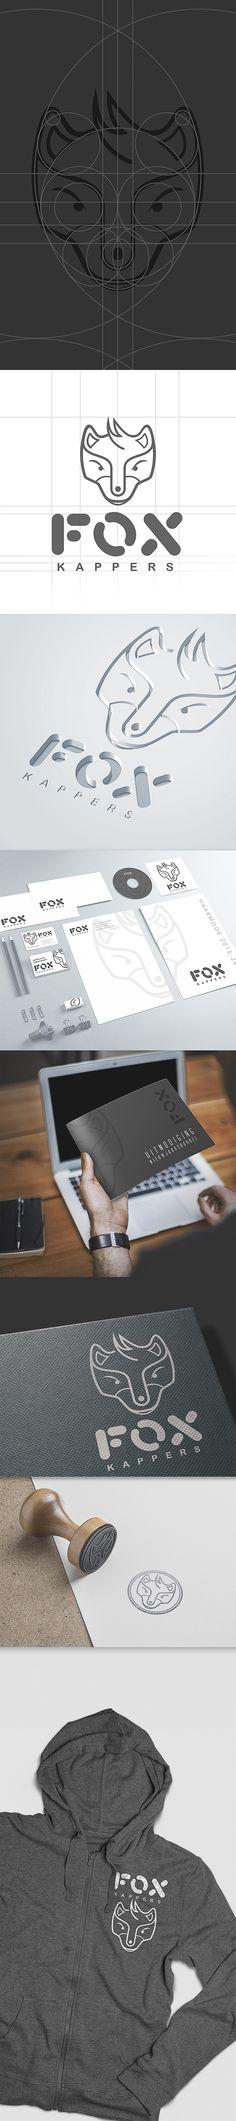 Fox-Kappers-Collage1.jpg (724×6508)